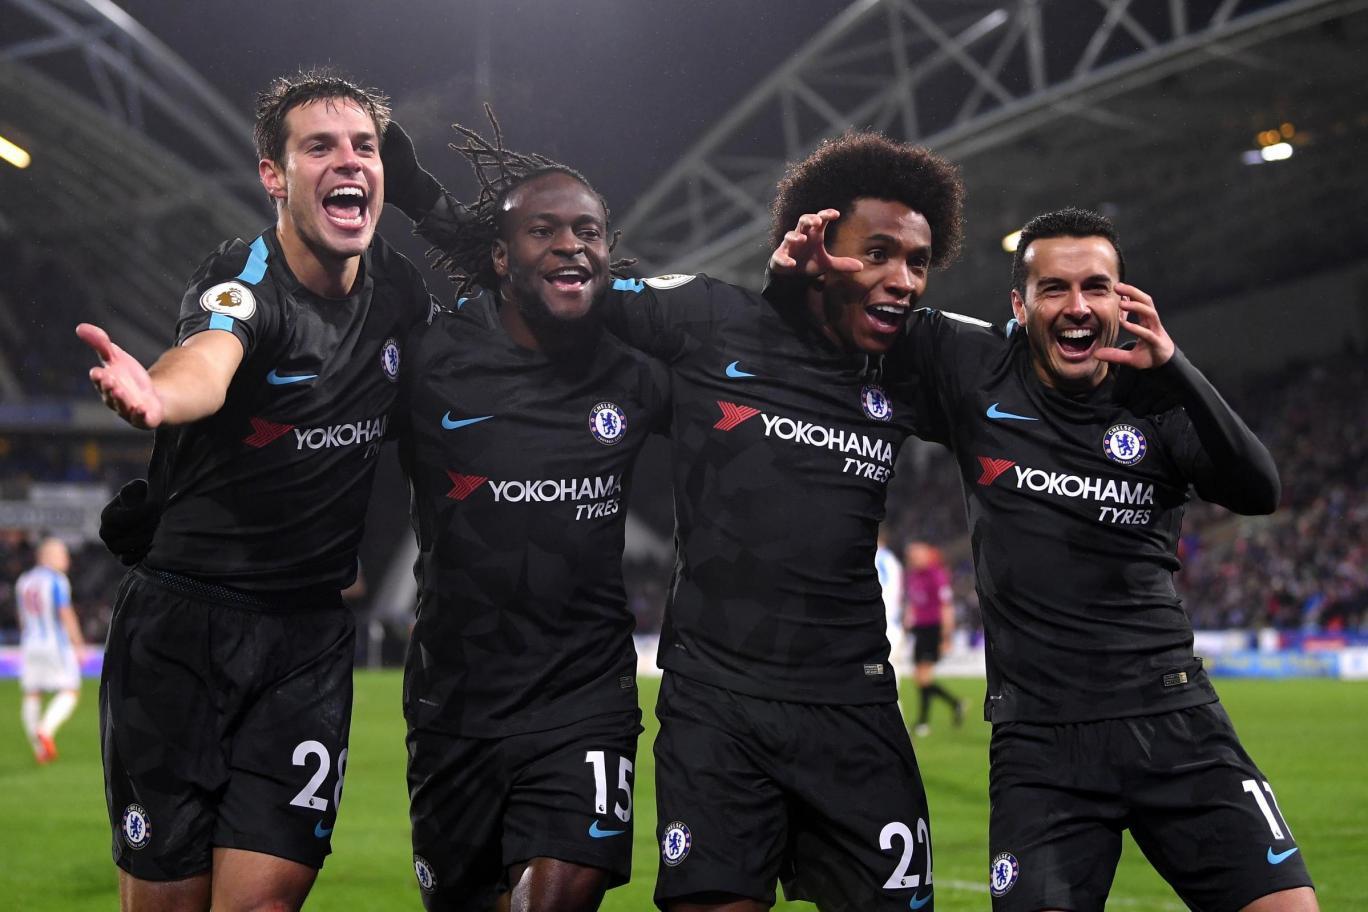 Download VIDEO: Huddersfield 1-3 Chelsea (EPL) / Highlights & Goals